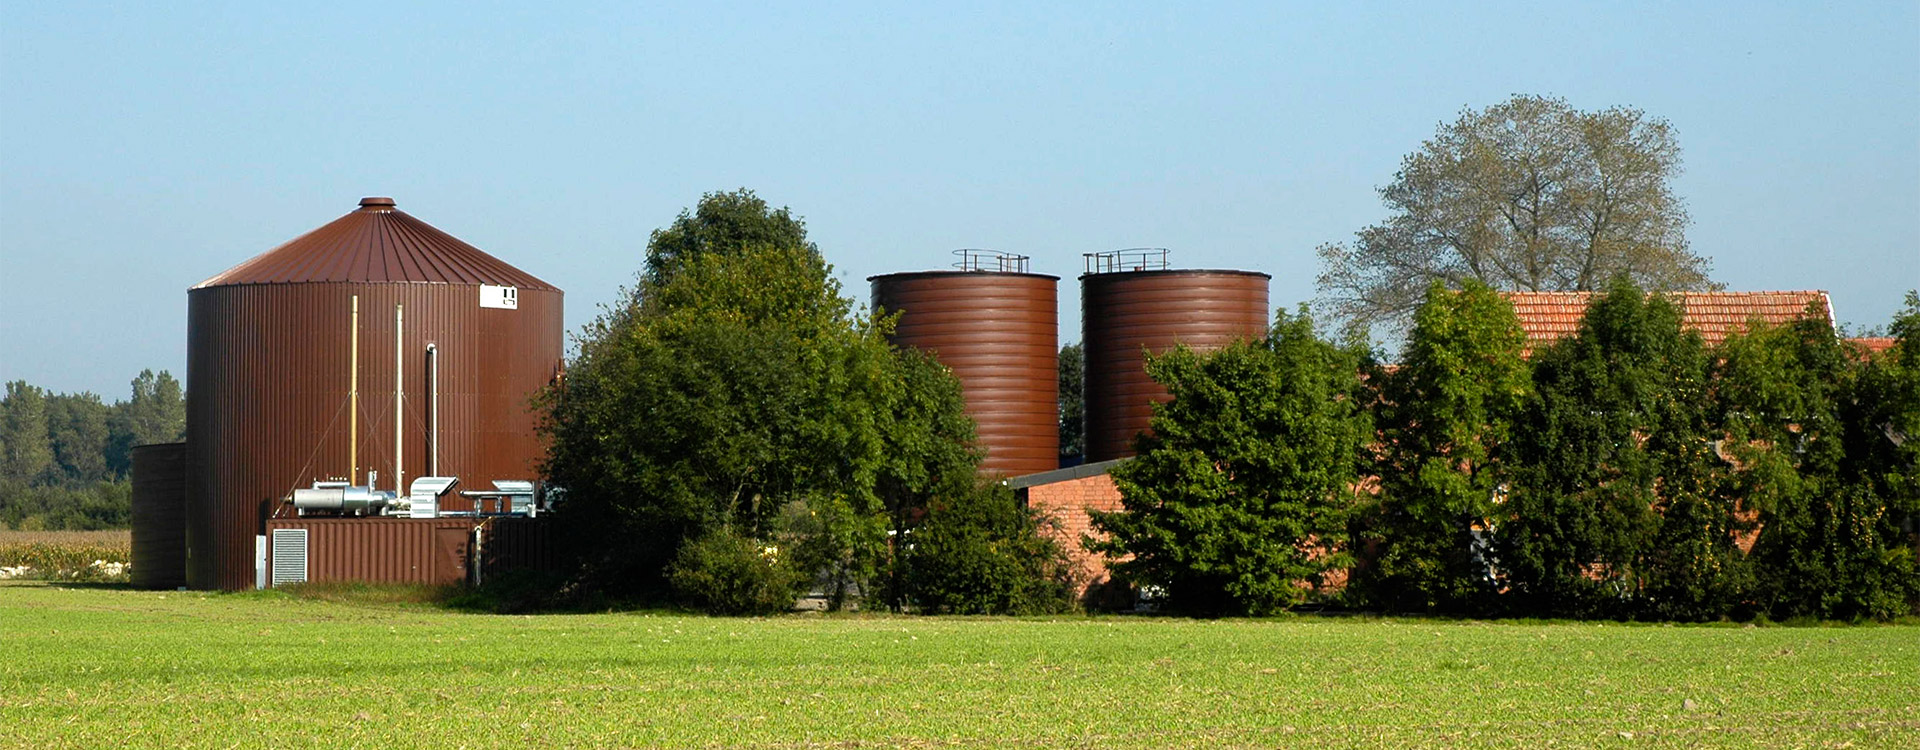 Lipp Agriculture Biogas - Lipp System